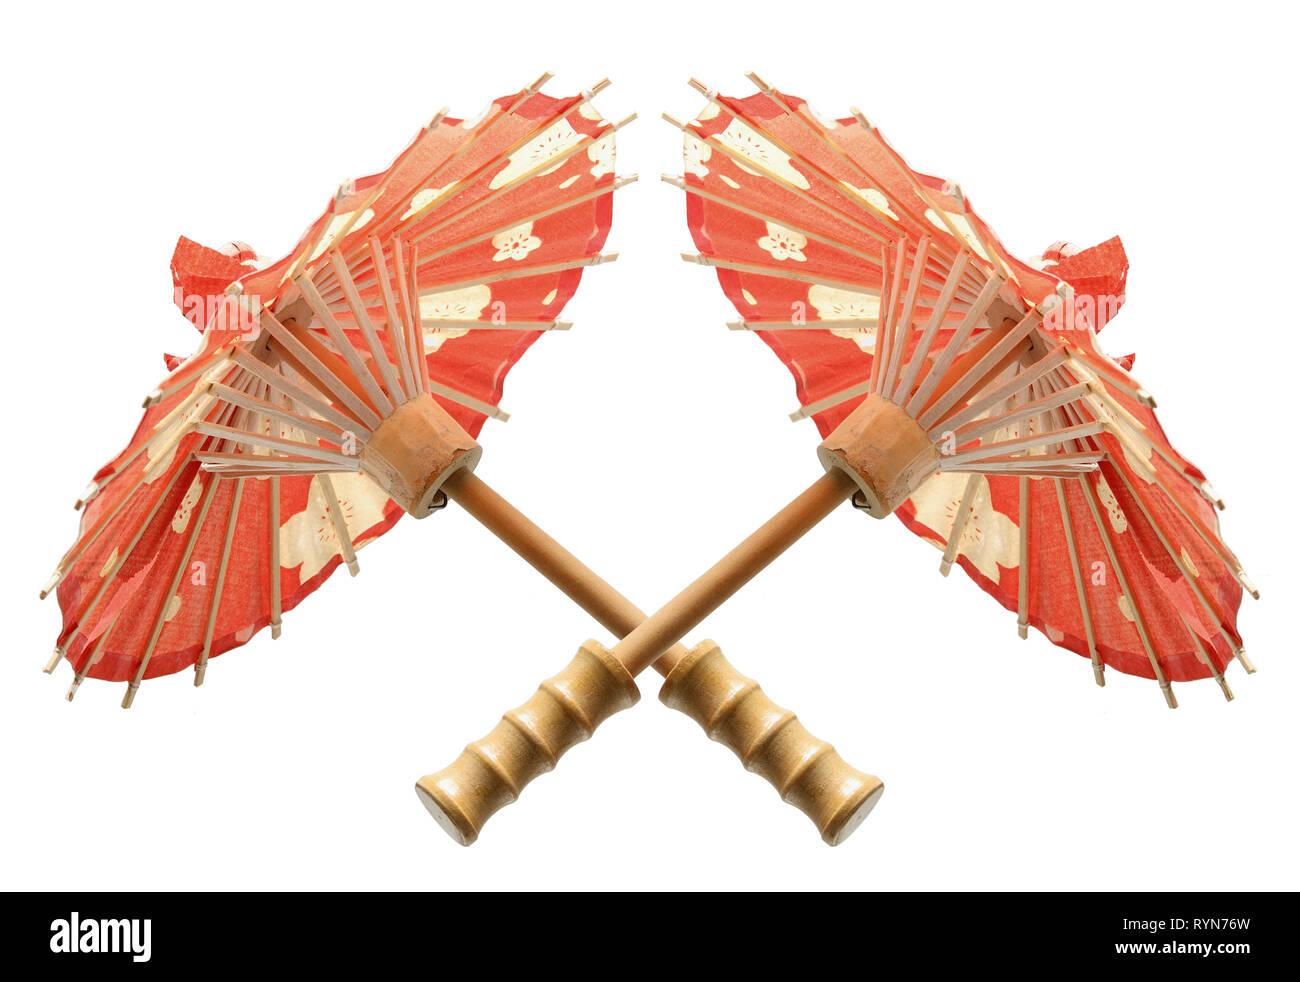 Miniature Paper Umbrellas on White Background - Stock Image